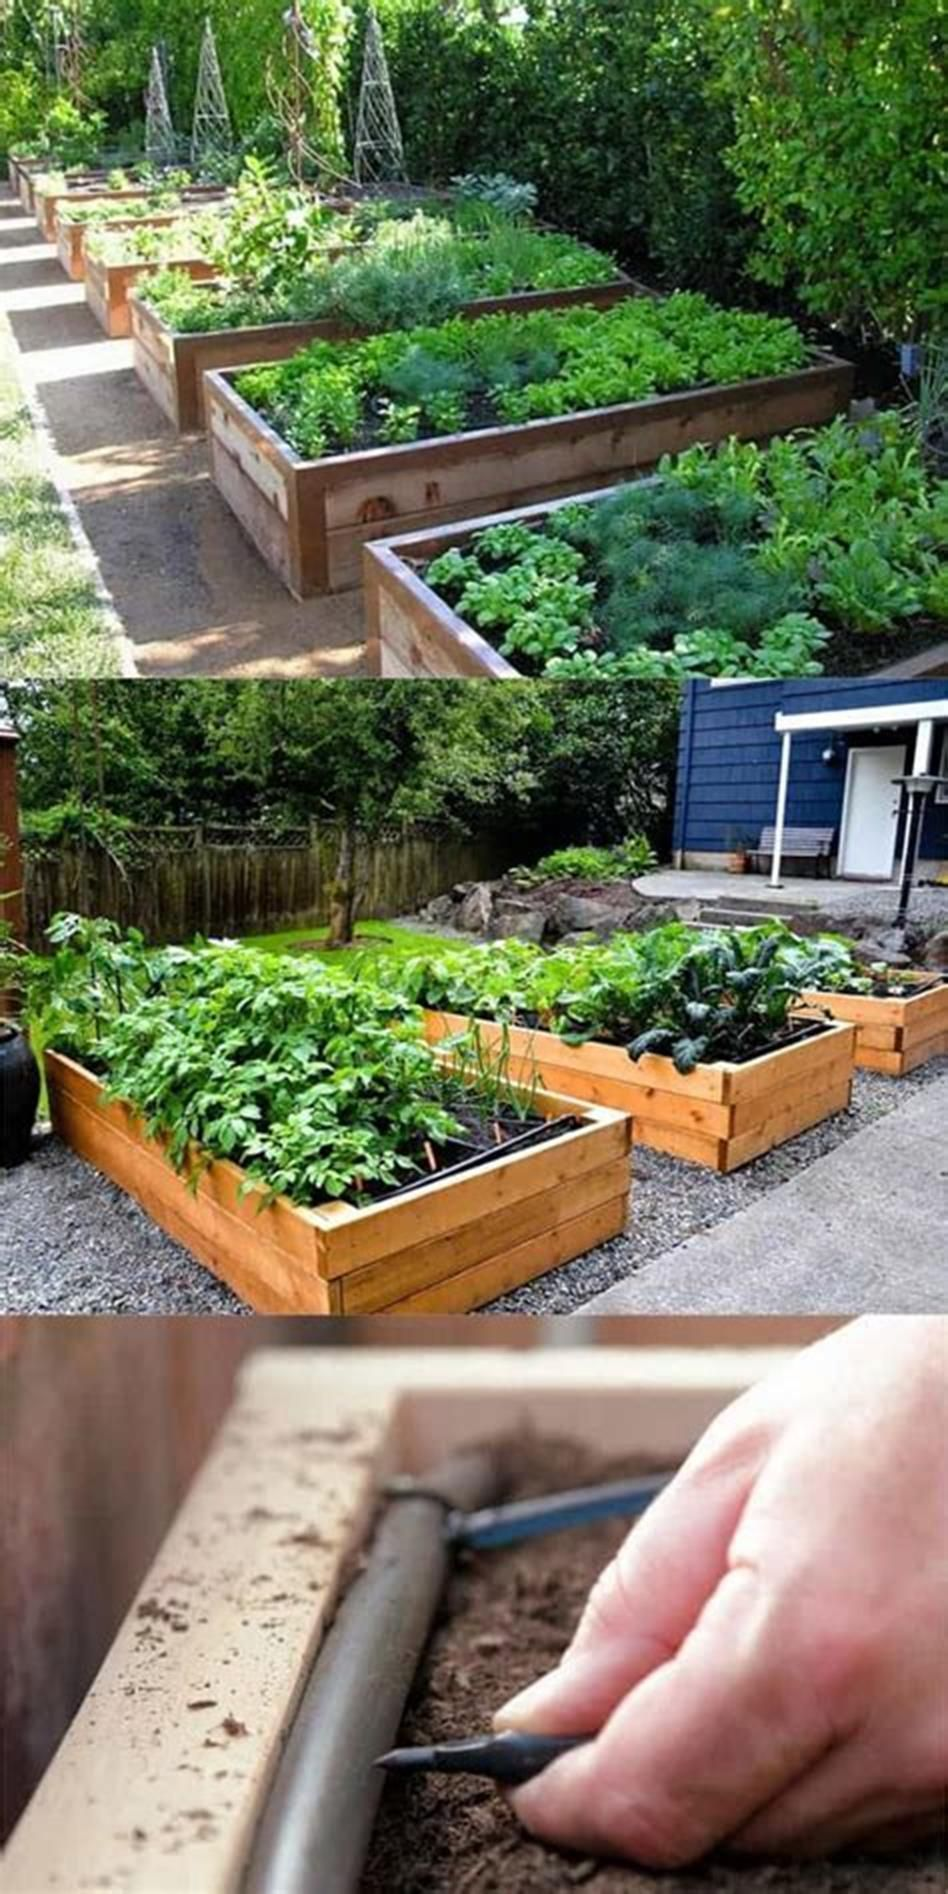 41 Beautiful Diy Backyard Vegetable Garden Ideas 10 Vegetablegardening Backyard Vegetable Gardens Small Vegetable Gardens Vegetable Garden Layout Design Backyard garden raised bed plans